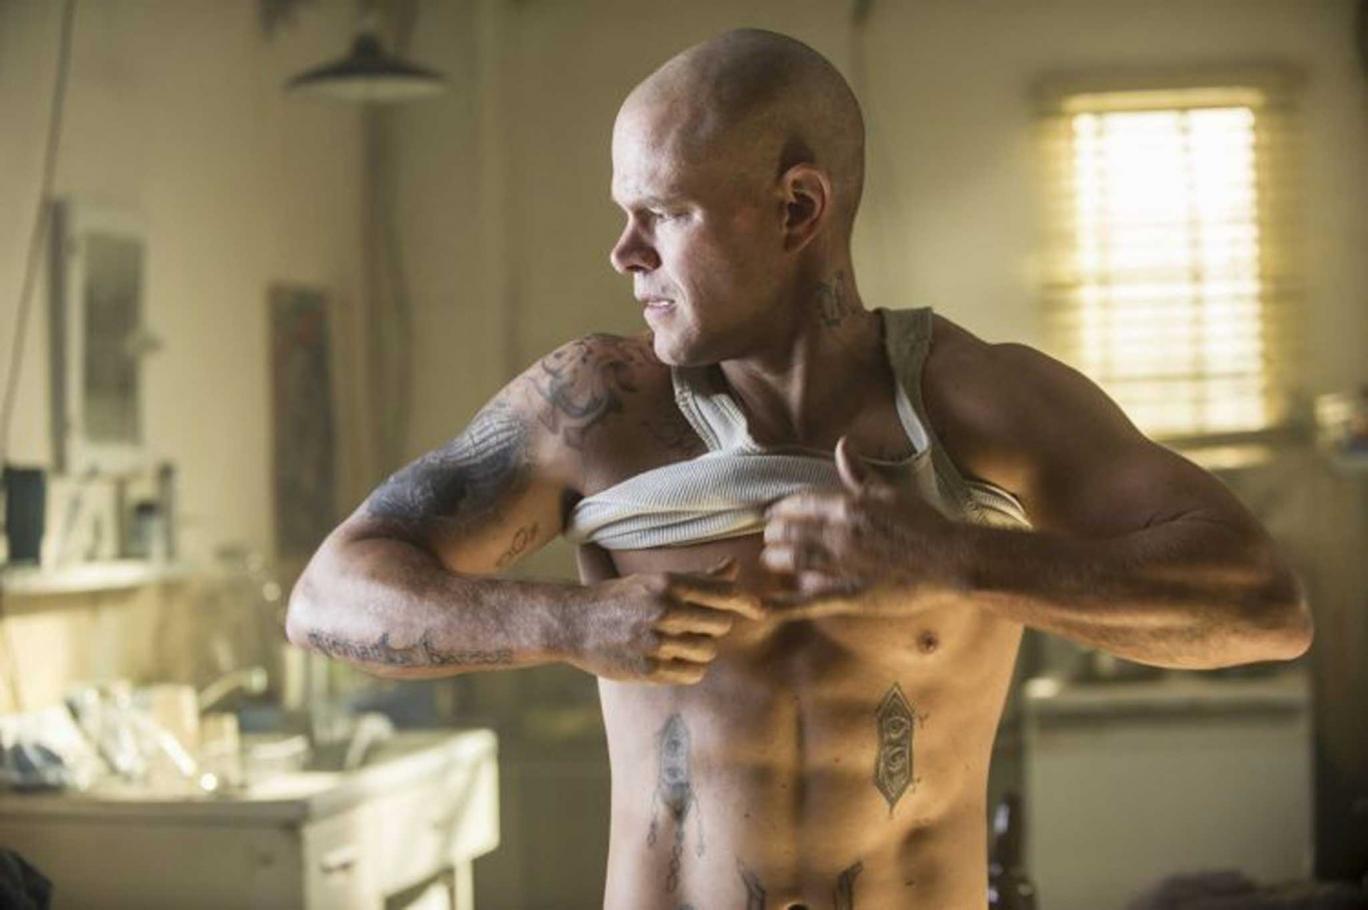 The newly shorn identity: Matt Damon is an ex-con in Neill Blomkamp's science-fiction thriller 'Elysium'